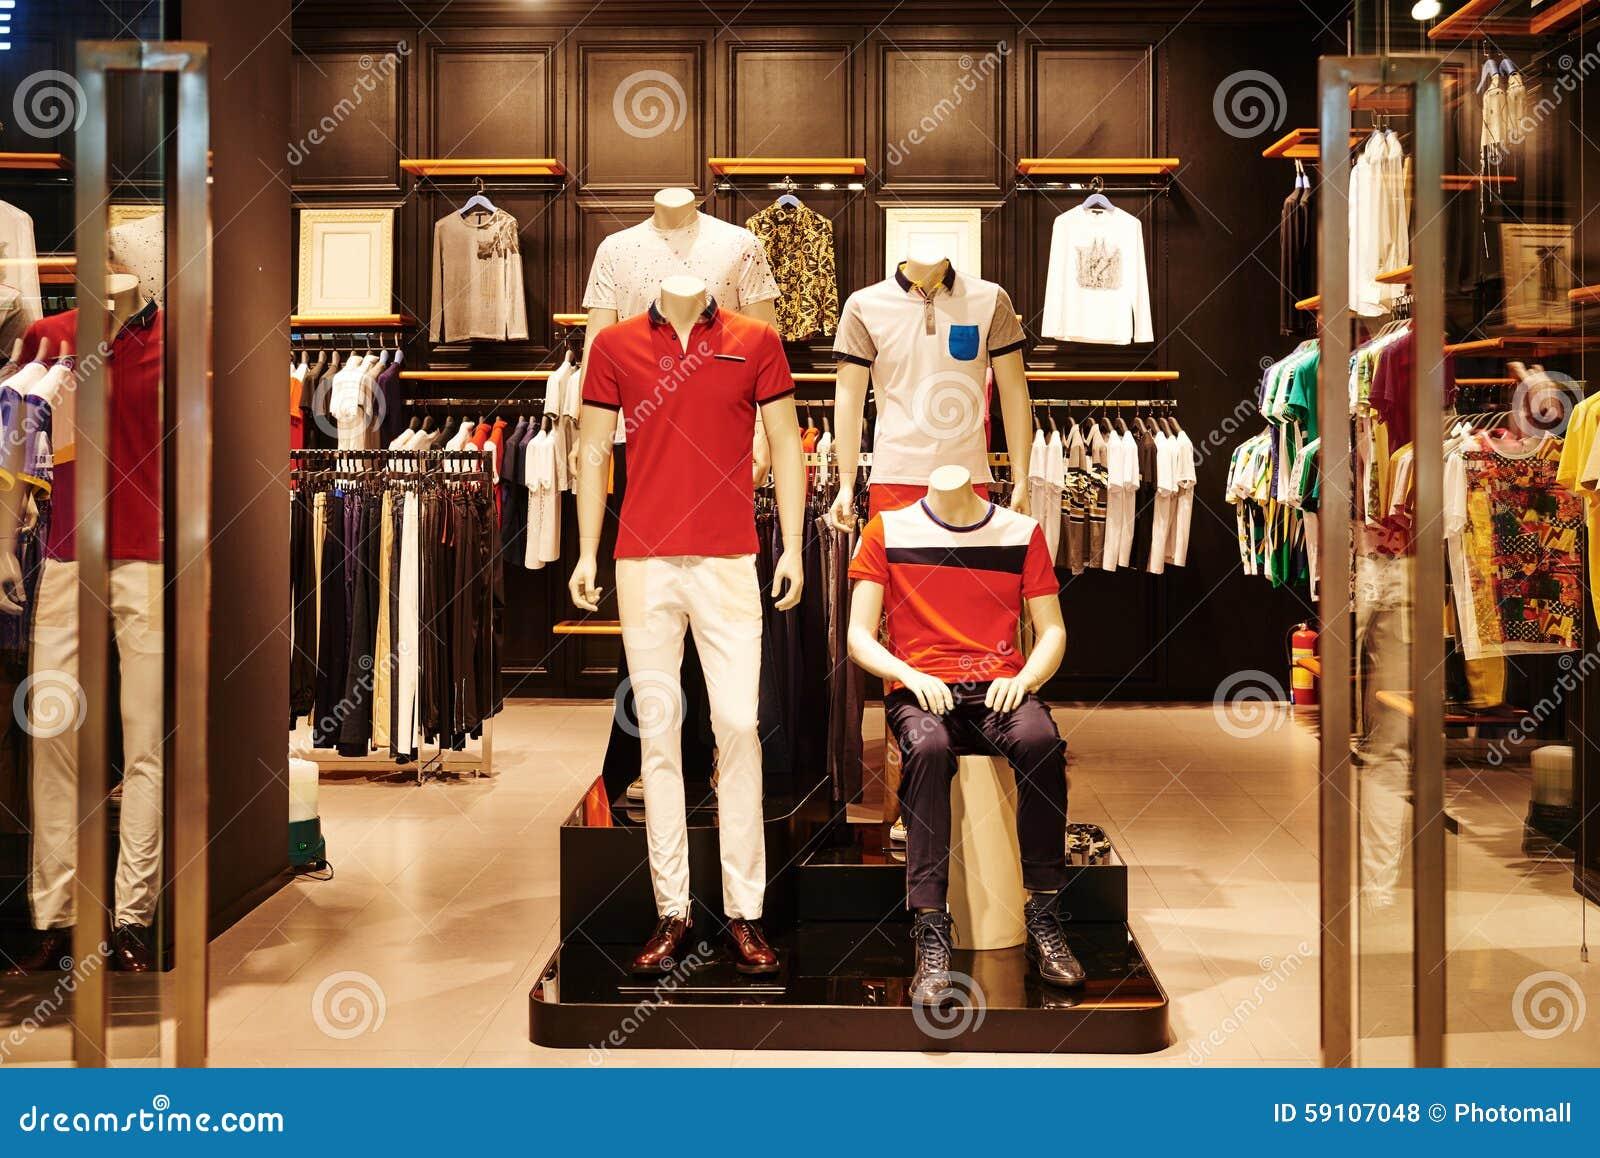 Mens Designer Clothing Shops | Mens Fashion Shop Window Boutique Stock Photo Image Of Boutique